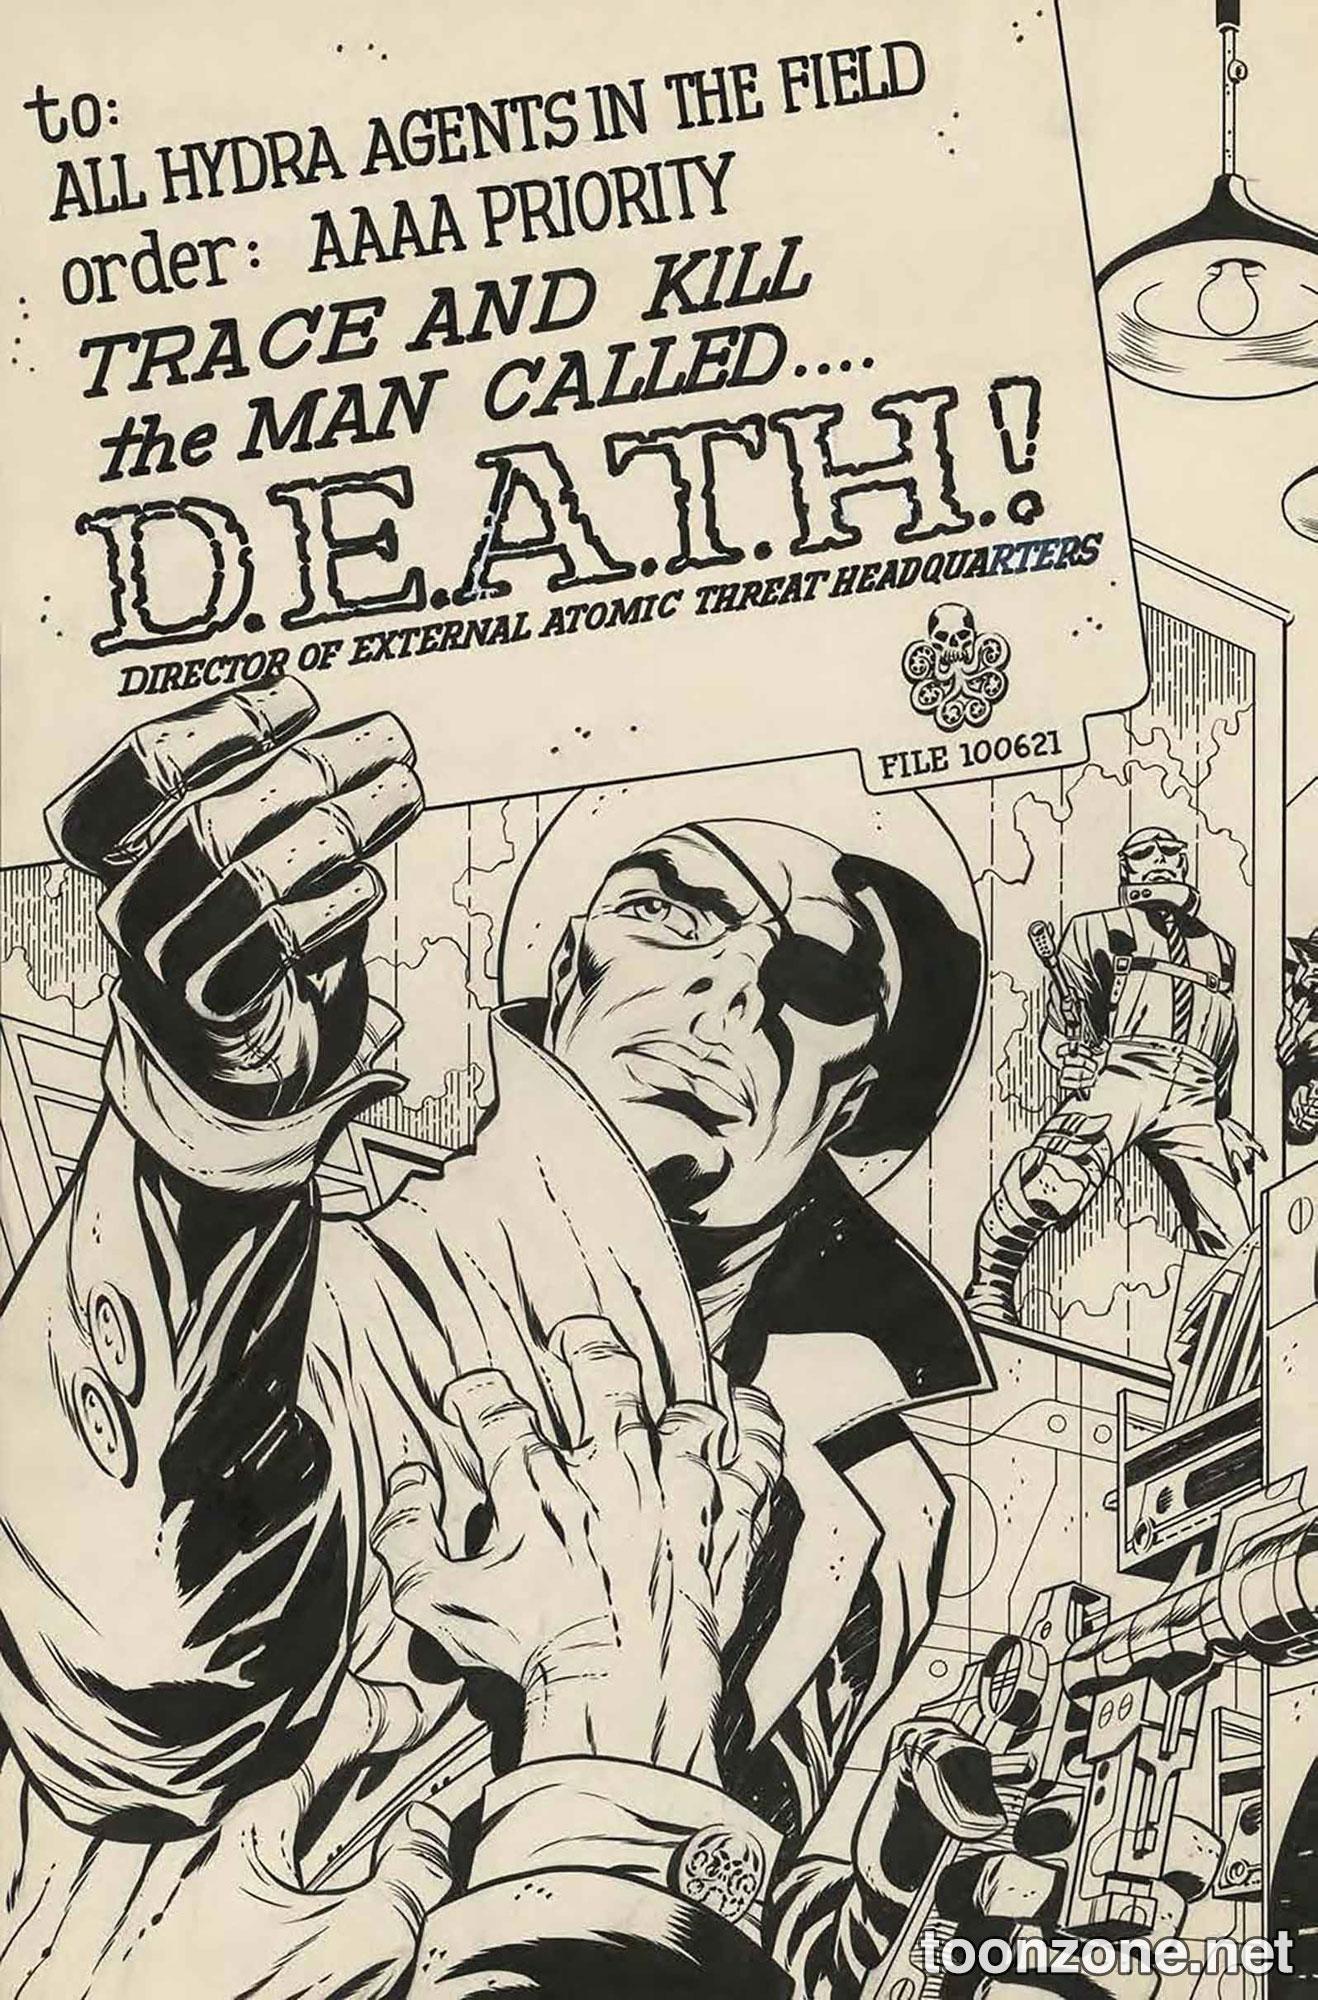 S.H.I.E.L.D. #9 (Jack Kirby Variant)